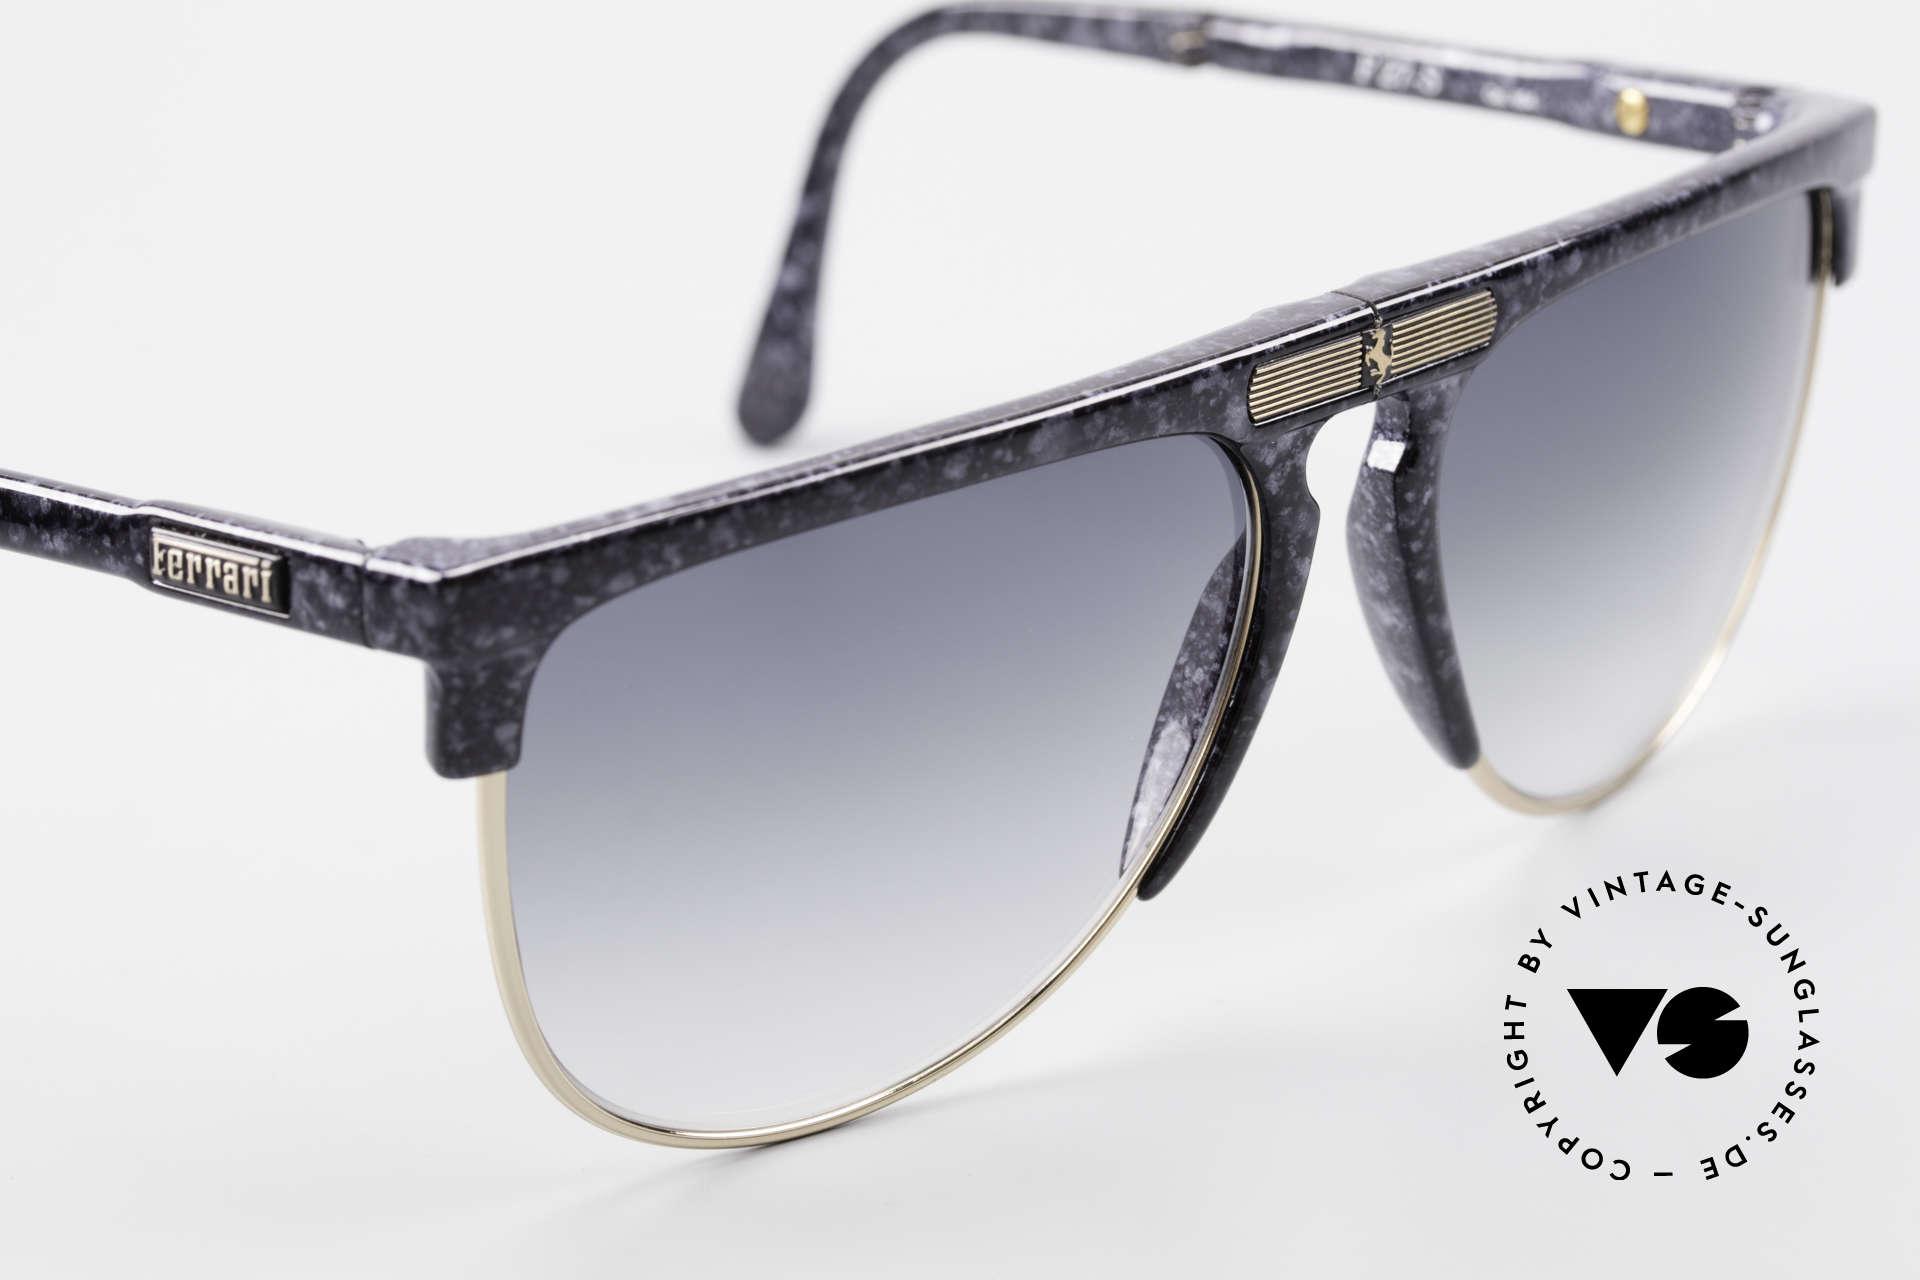 Ferrari F27/S Carbonio Folding Shades Rare, unworn (like all our rare Ferrari folding sunglasses), Made for Men